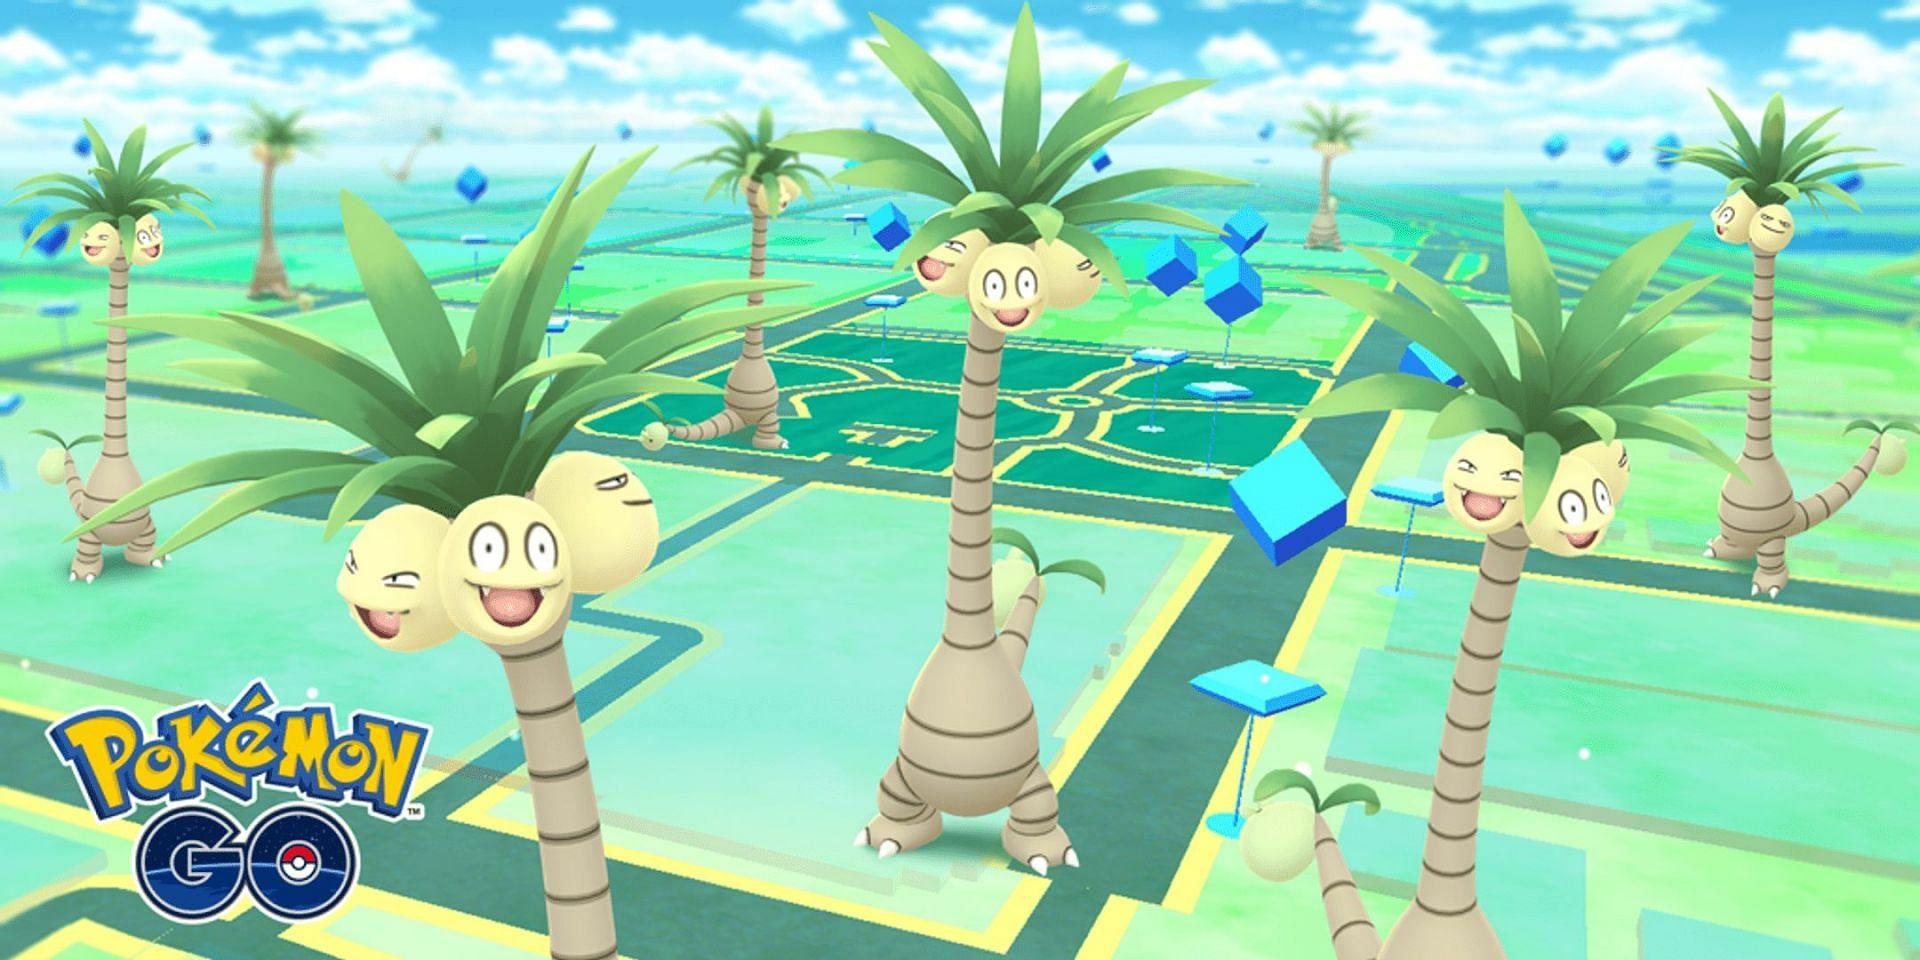 Alolan Exeggutor as it appears in Pokemon GO (Image via Niantic)